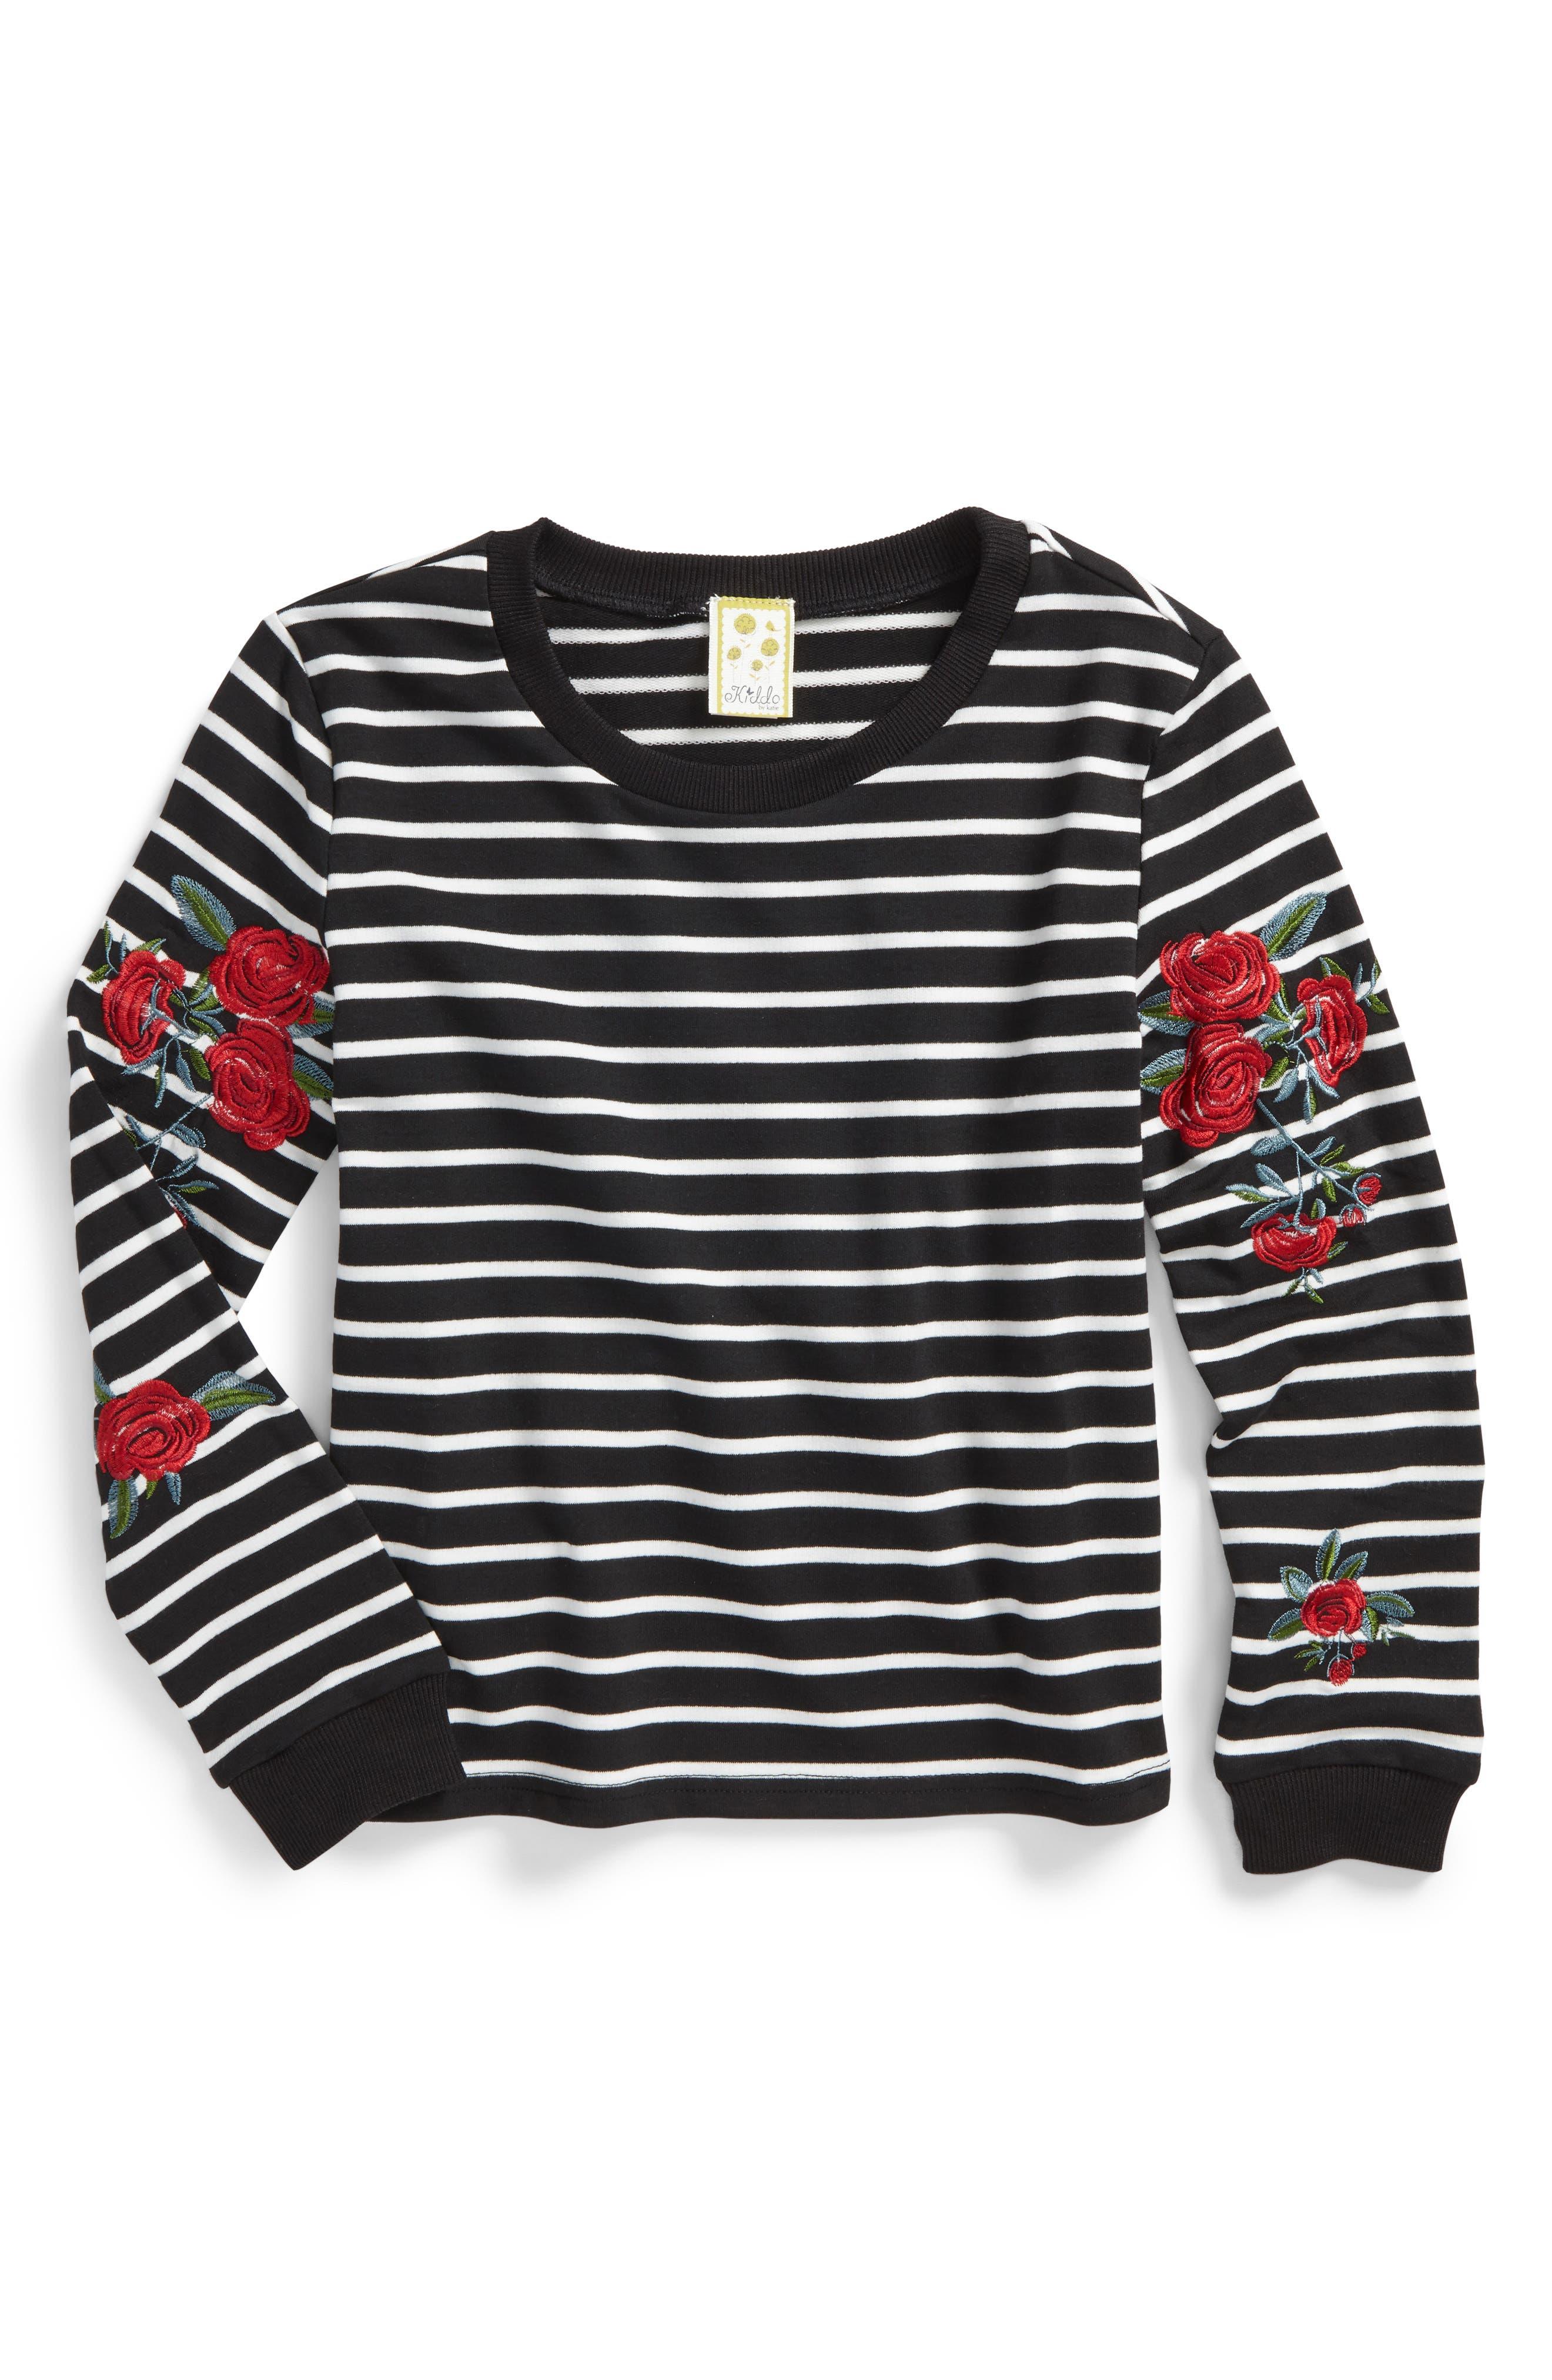 Embroidered Stripe Sweatshirt,                             Main thumbnail 1, color,                             001